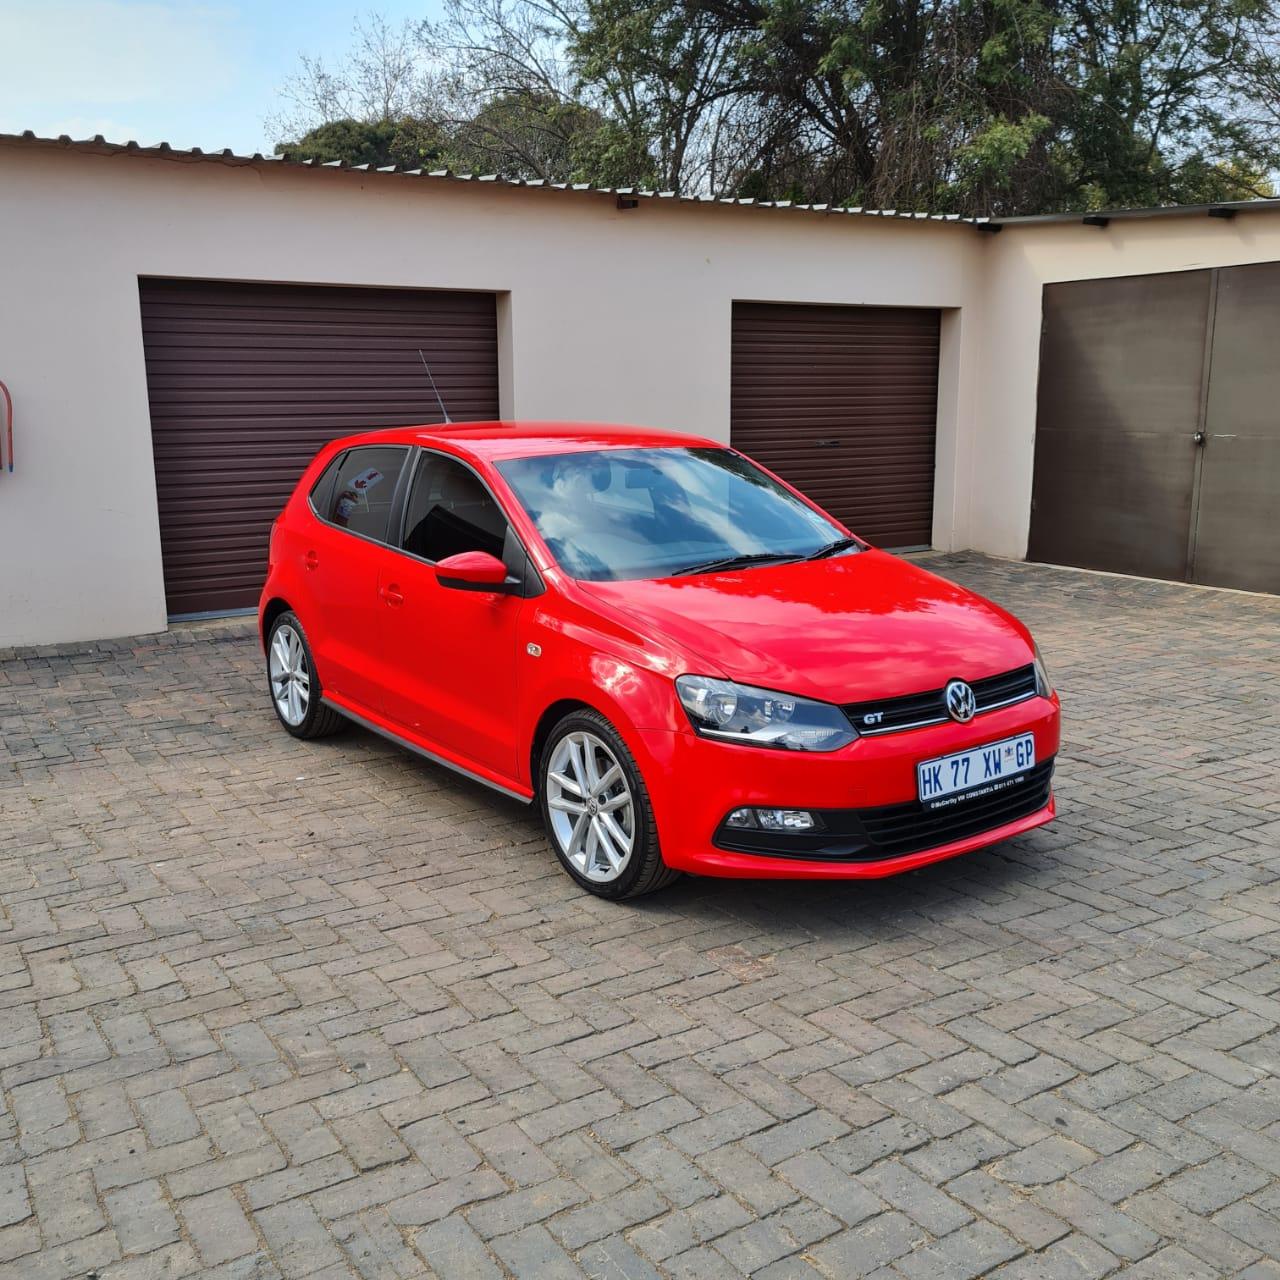 VW Polo Vivo Hatch 1.0 TSI GT for sale